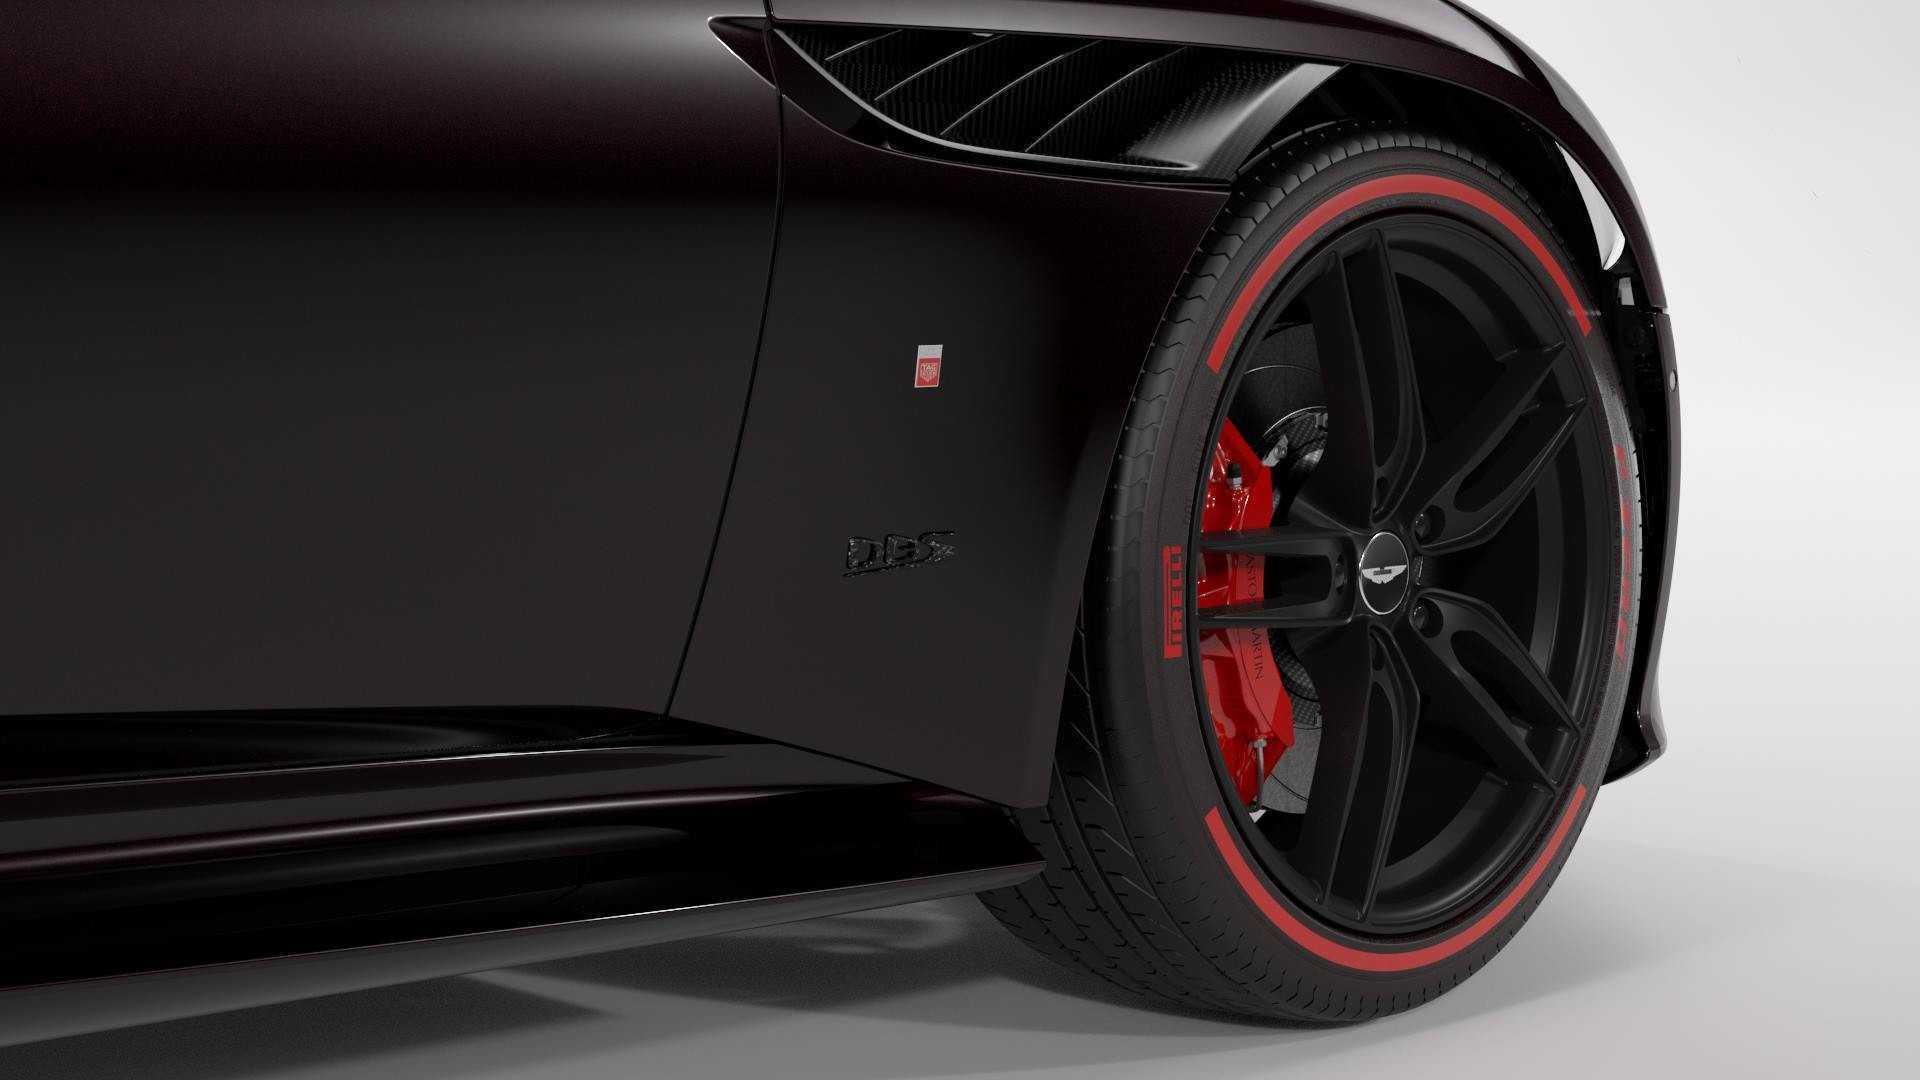 2019 Aston Martin DBS Superleggera Tag Heuer Edition